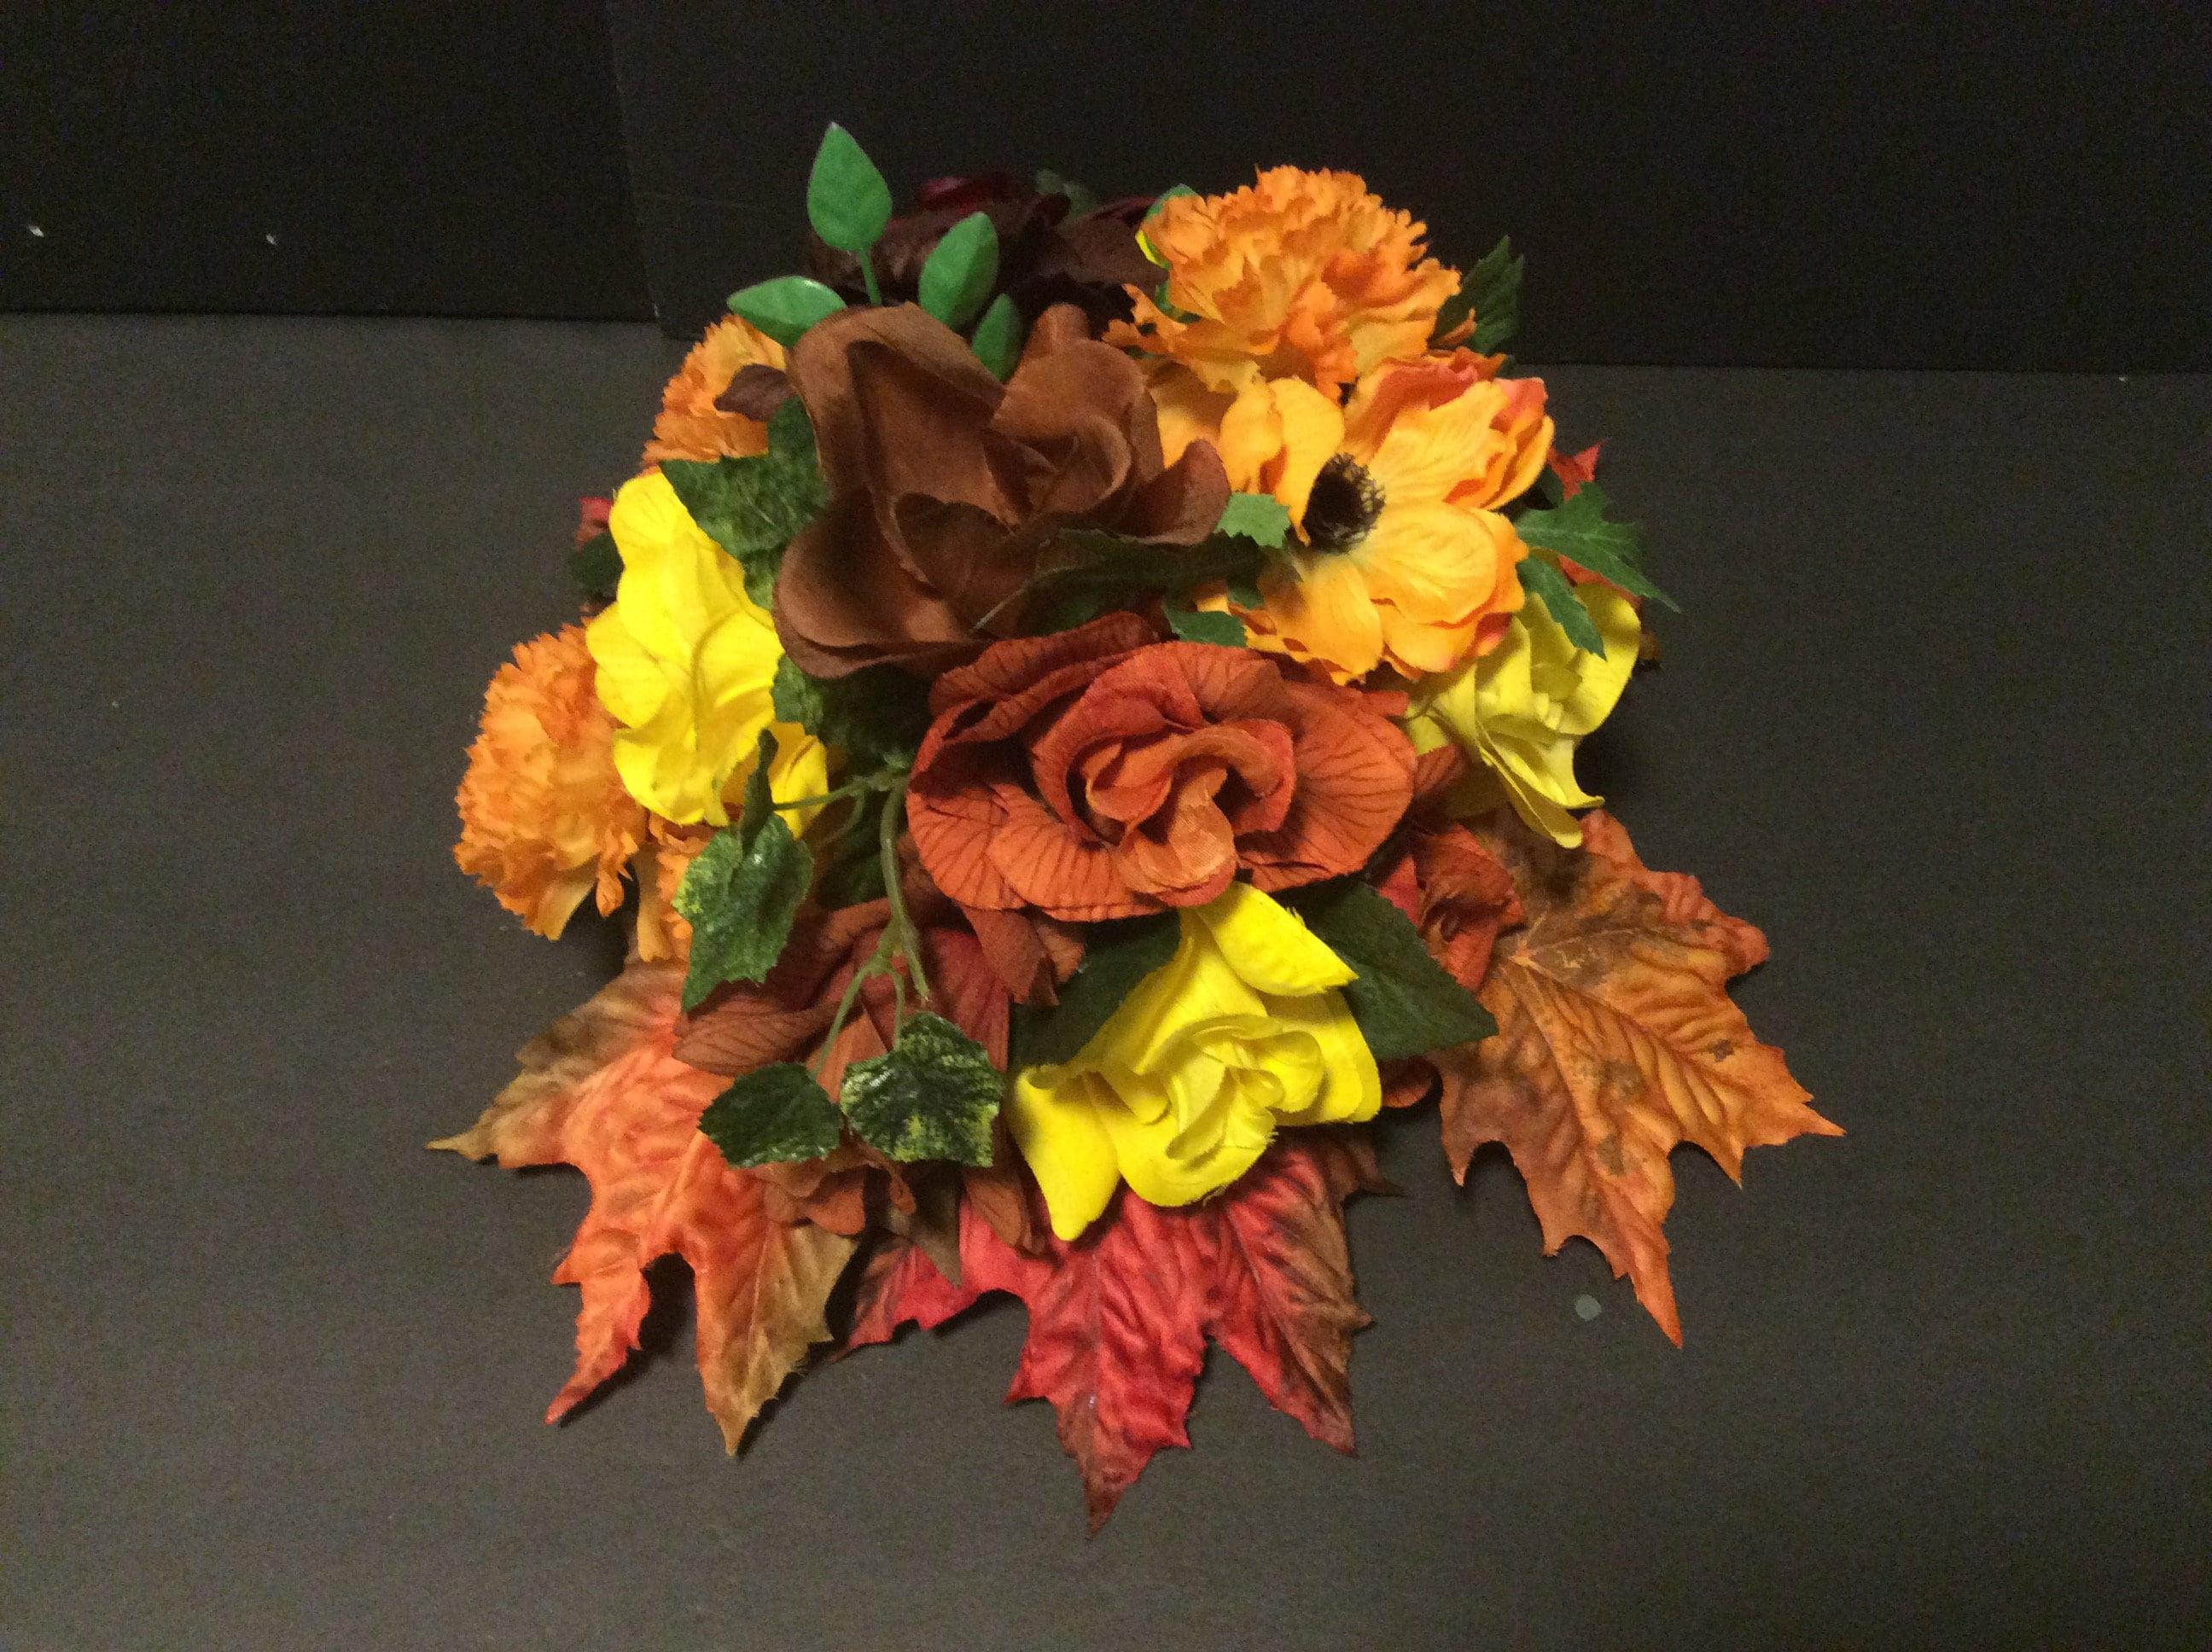 Autumn Fall Silk Flowers Floral Arrangement Centerpiece Etsy